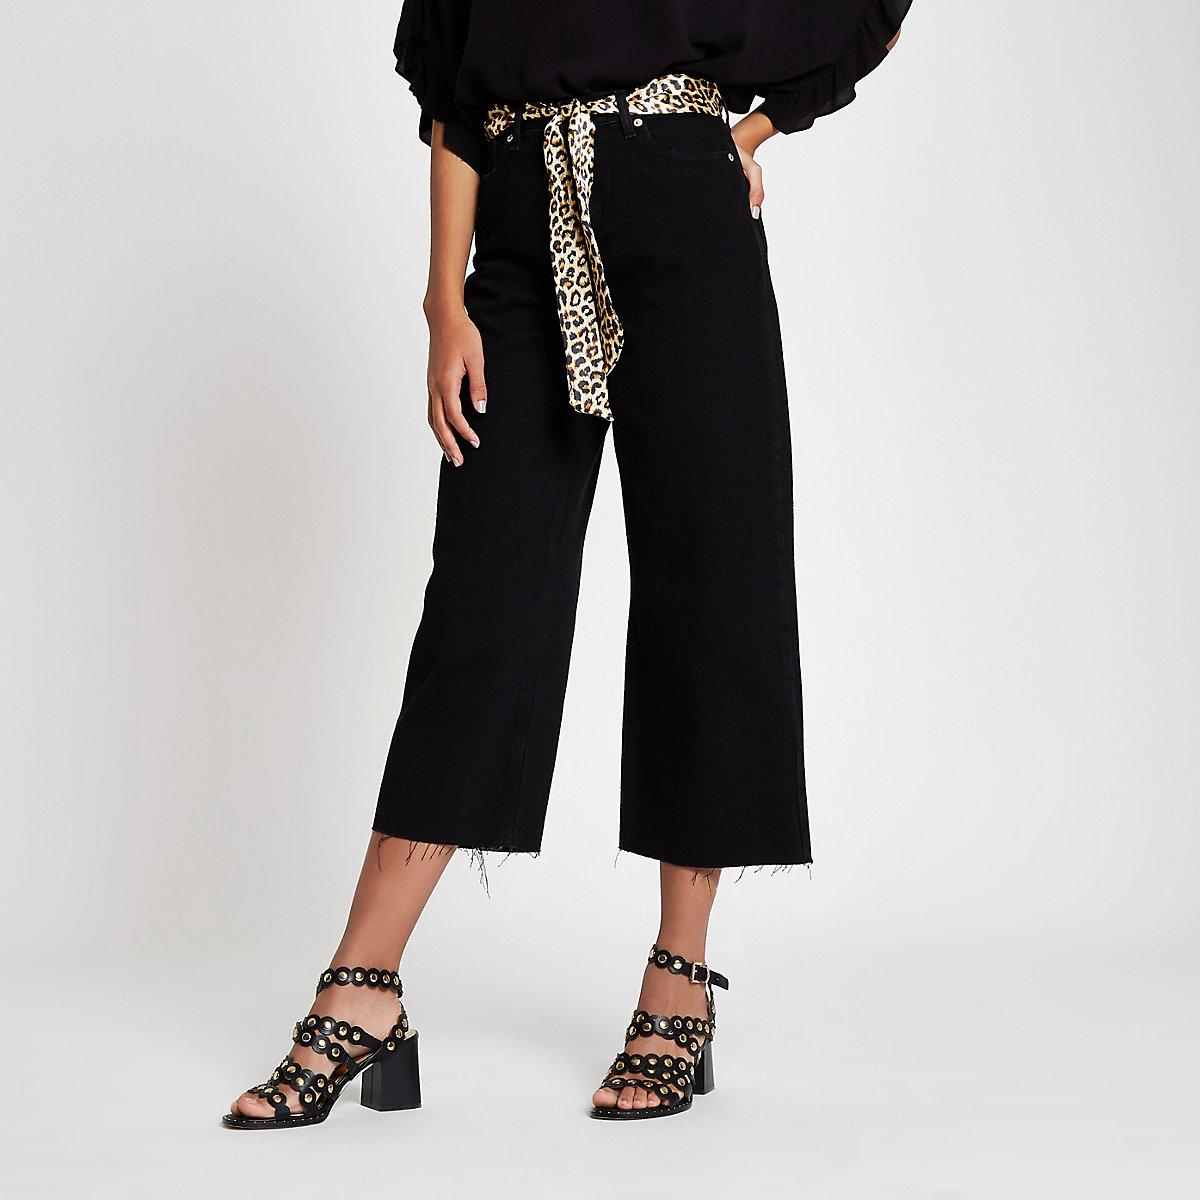 Black Alexa belted cropped wide leg jeans